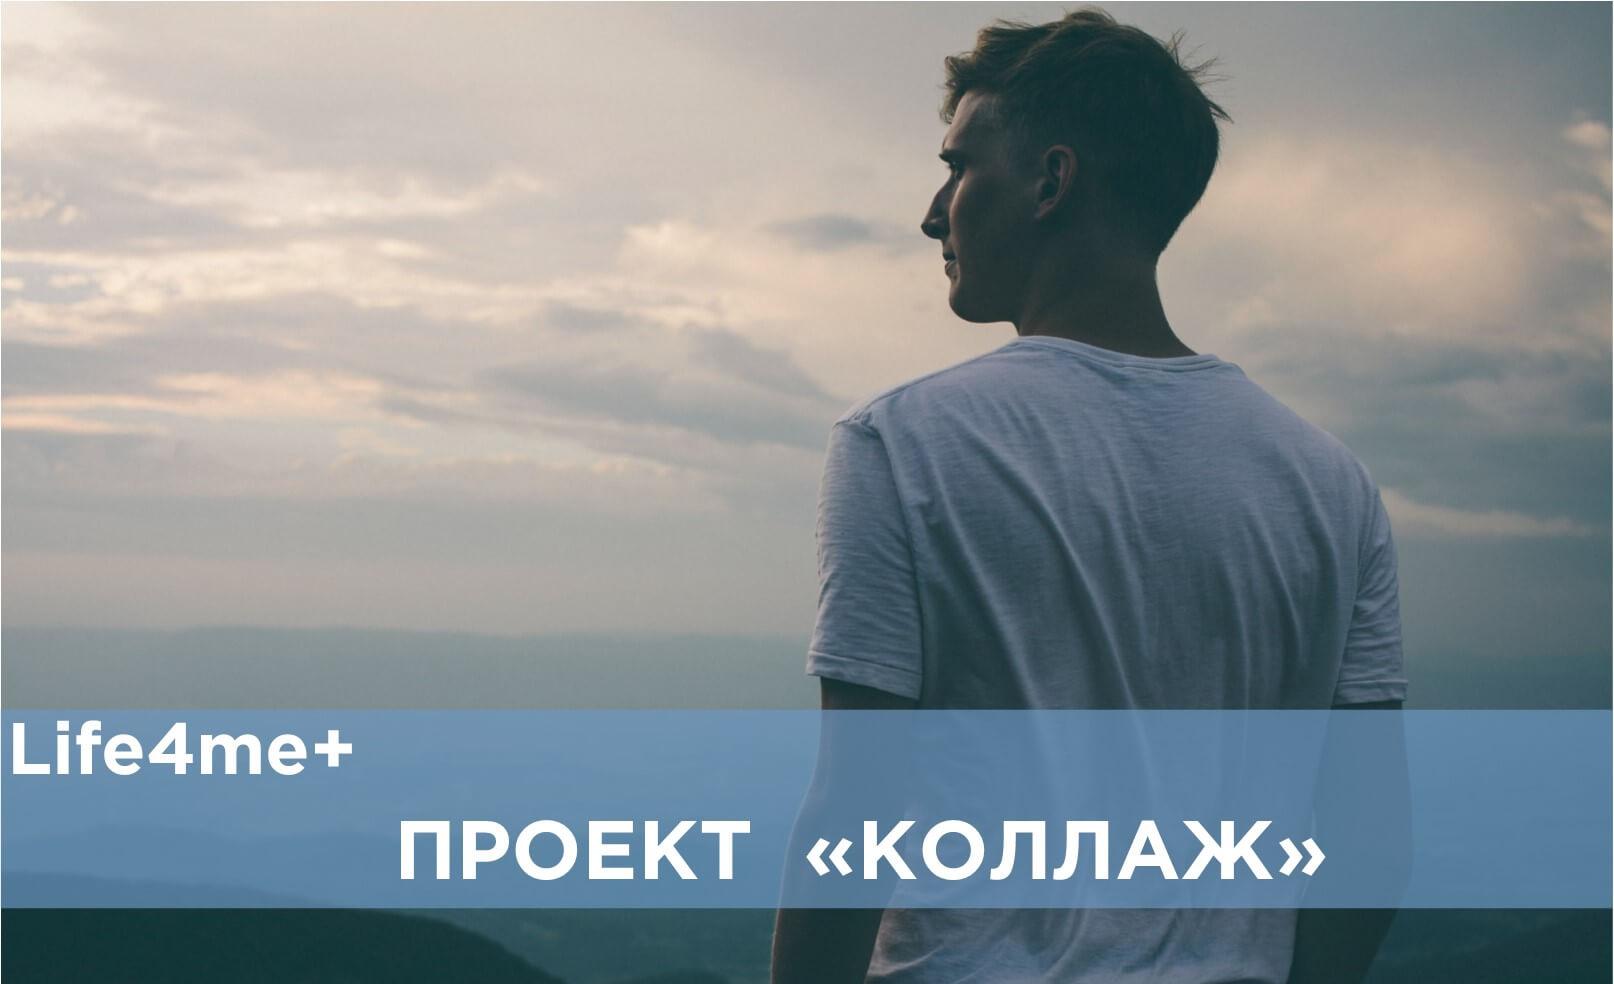 "Коллаж: ""Я столкнулся с дискриминацией среди ЛЖВ"", - Юрий «Vichevoi» - изображение 1"